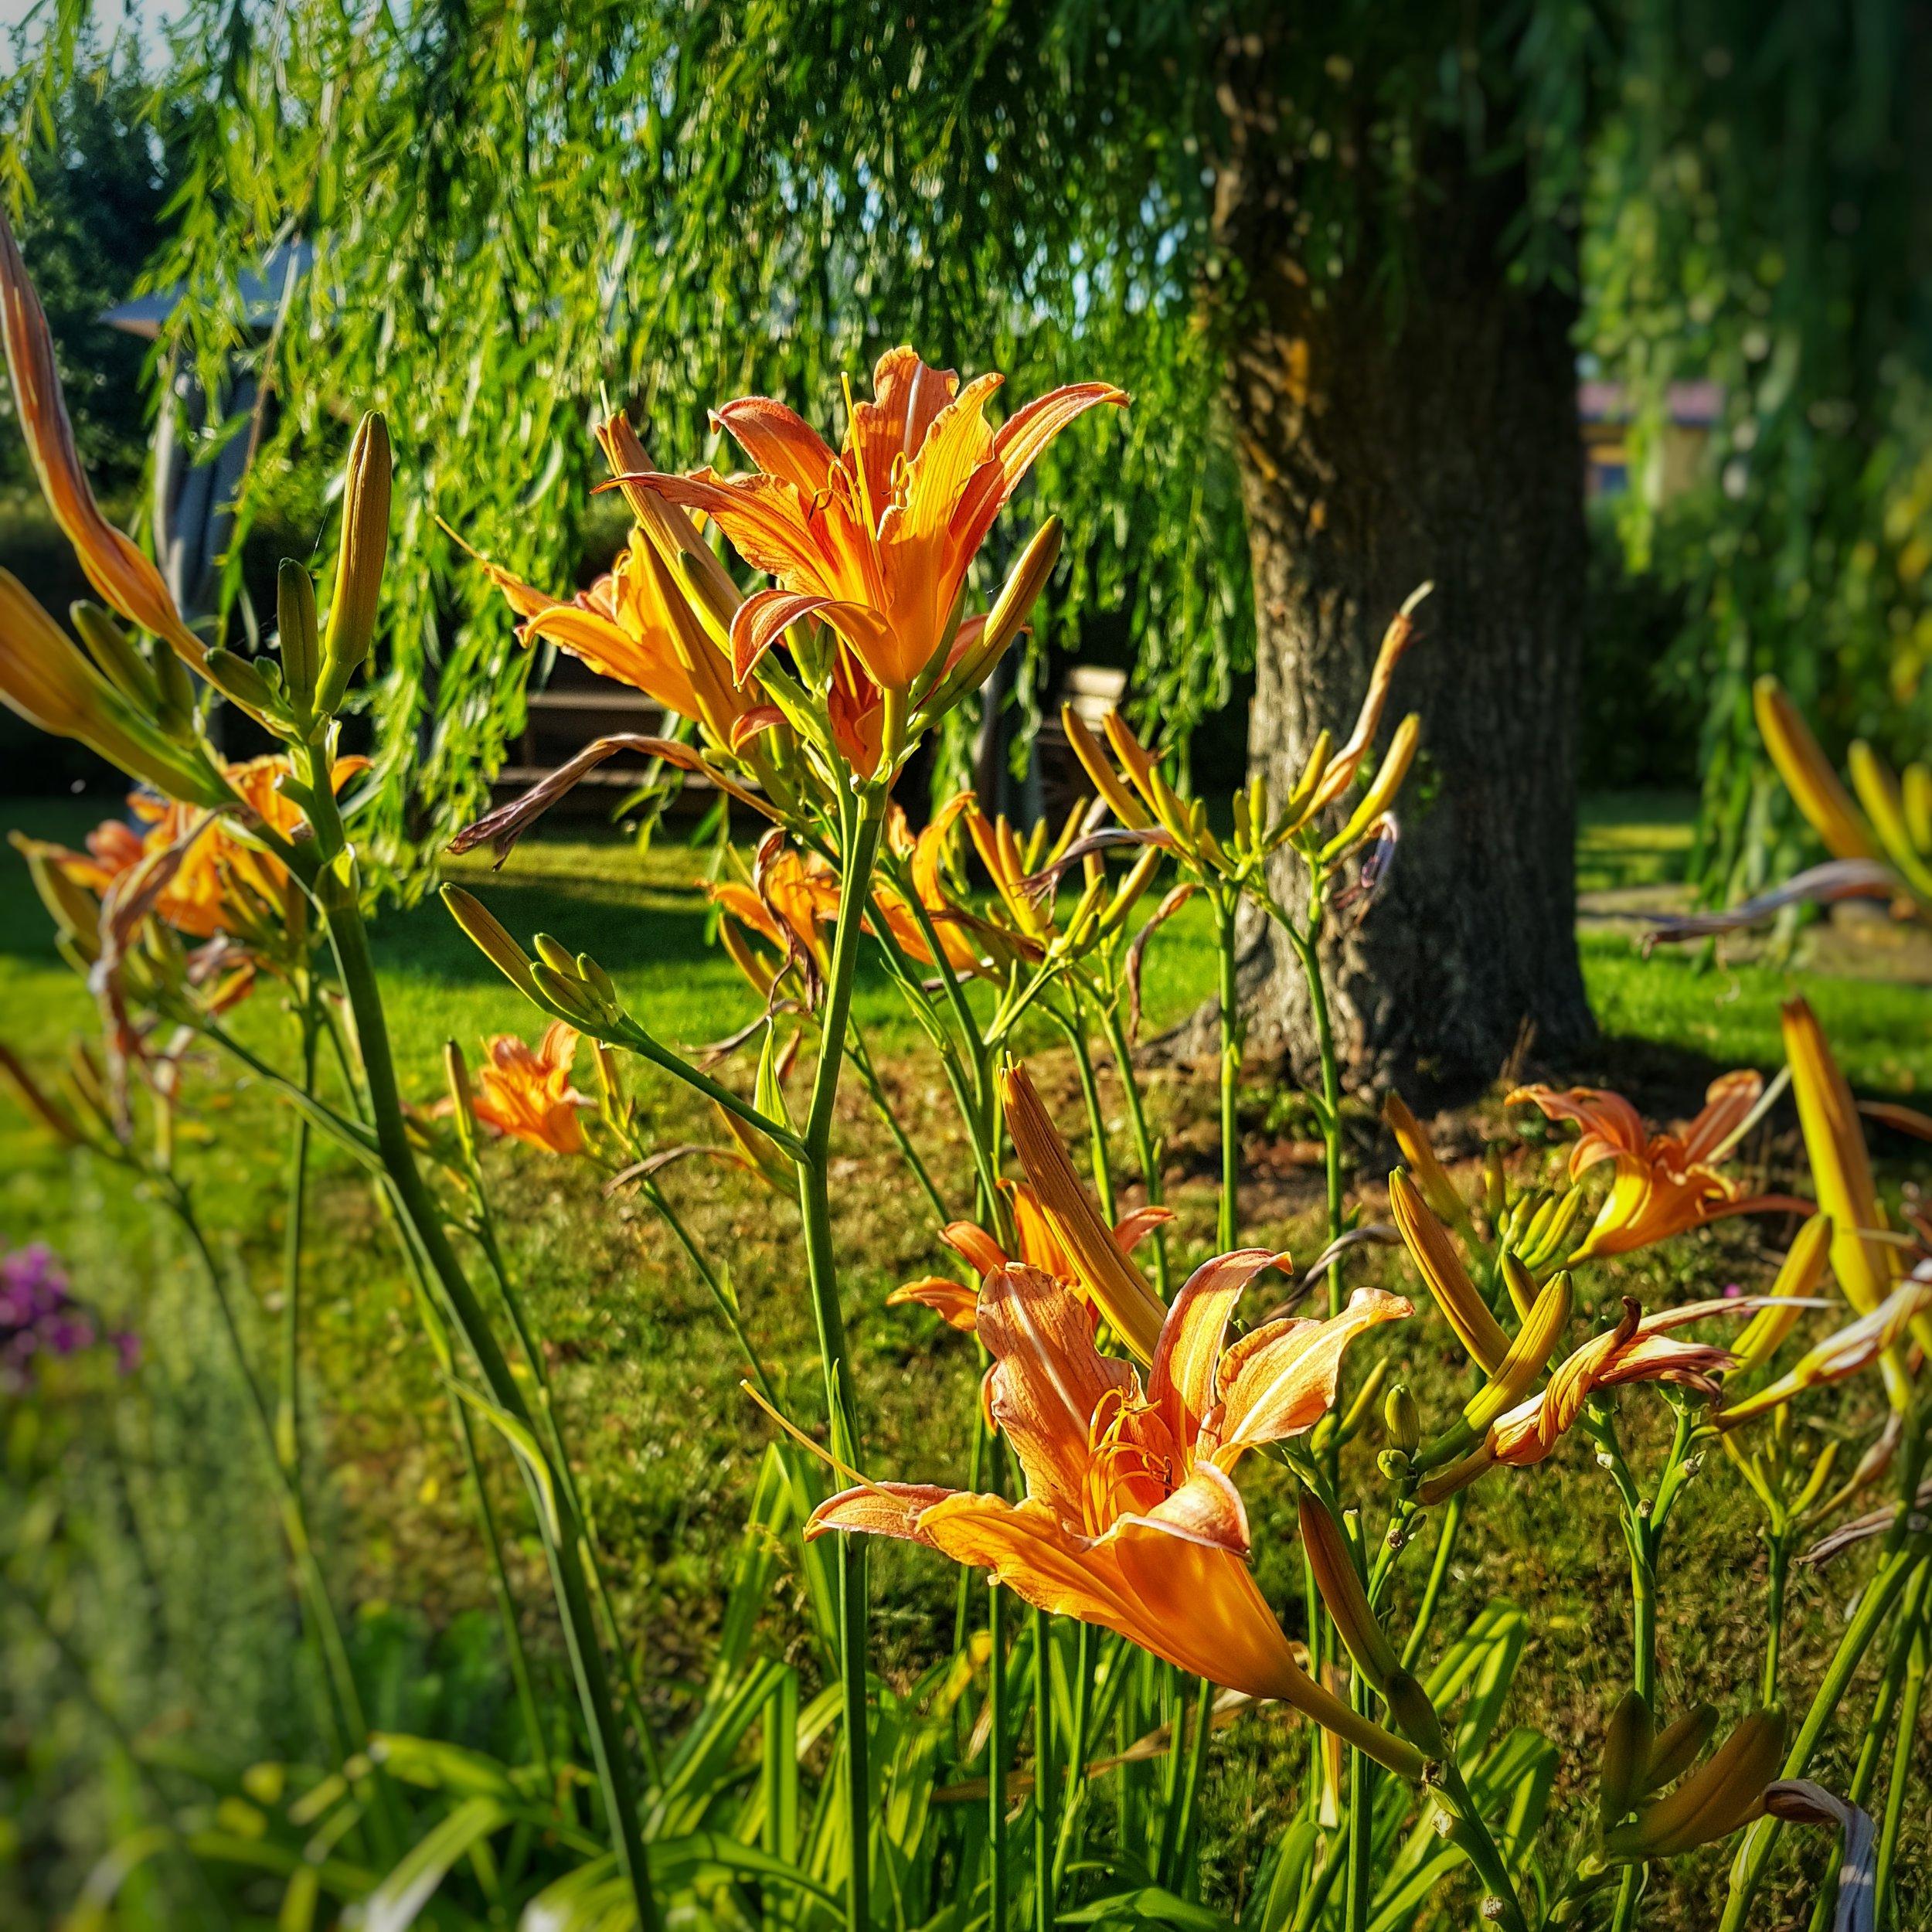 Day 207 - July 26: Flower Closeups